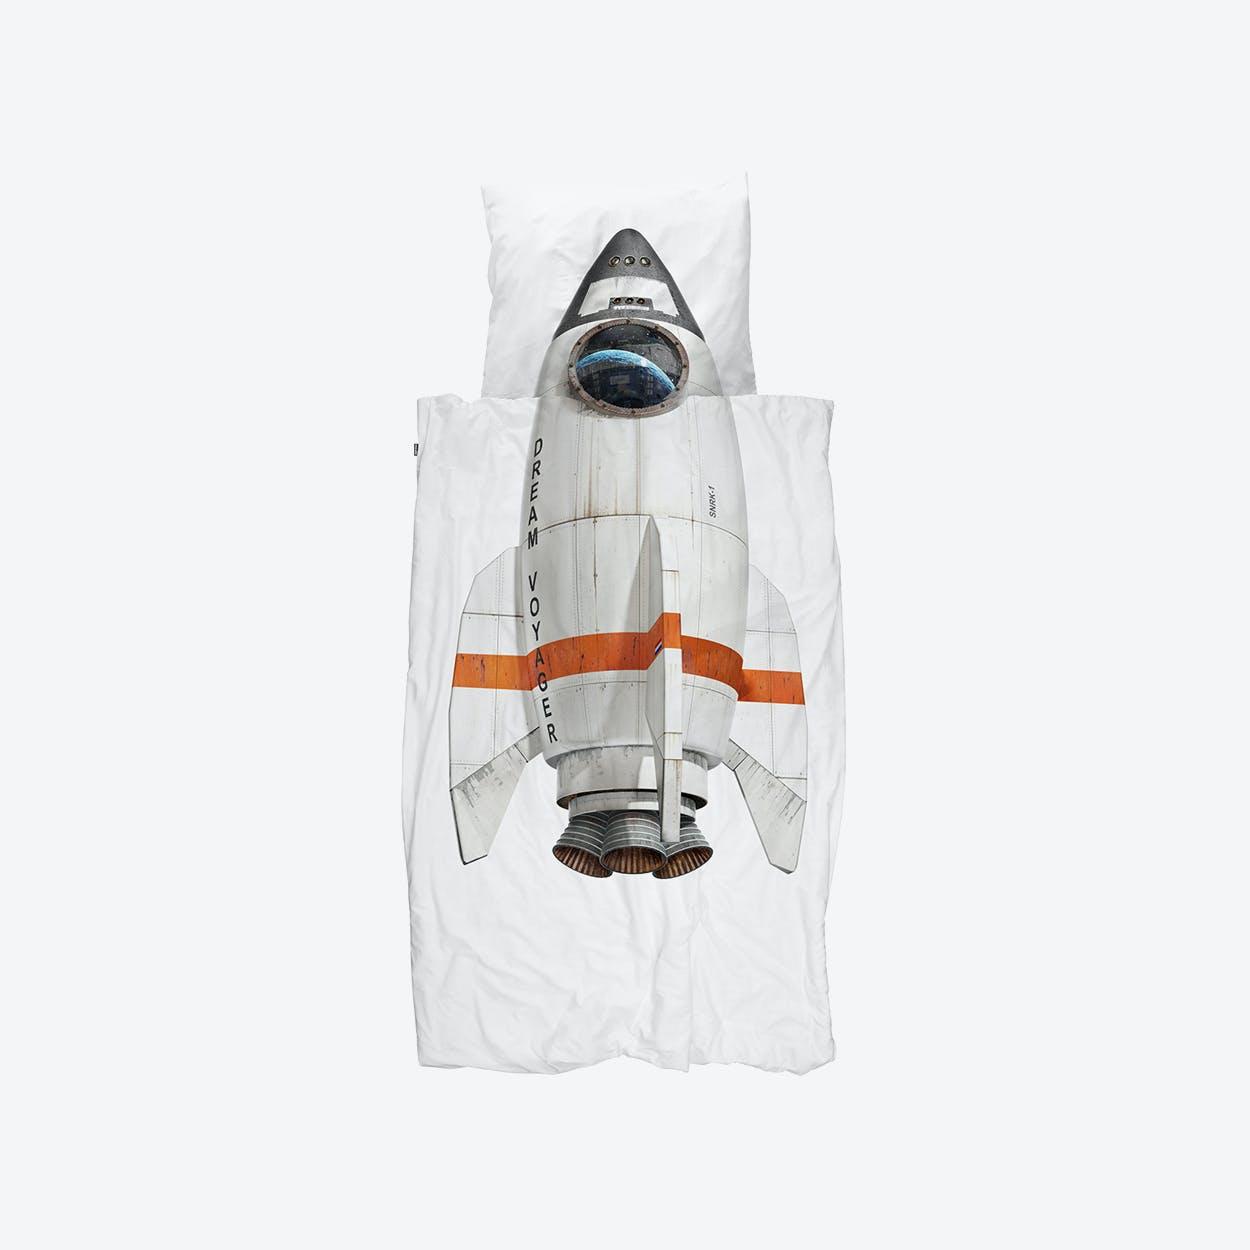 Rocket Duvet Cover & Pillowcase Set